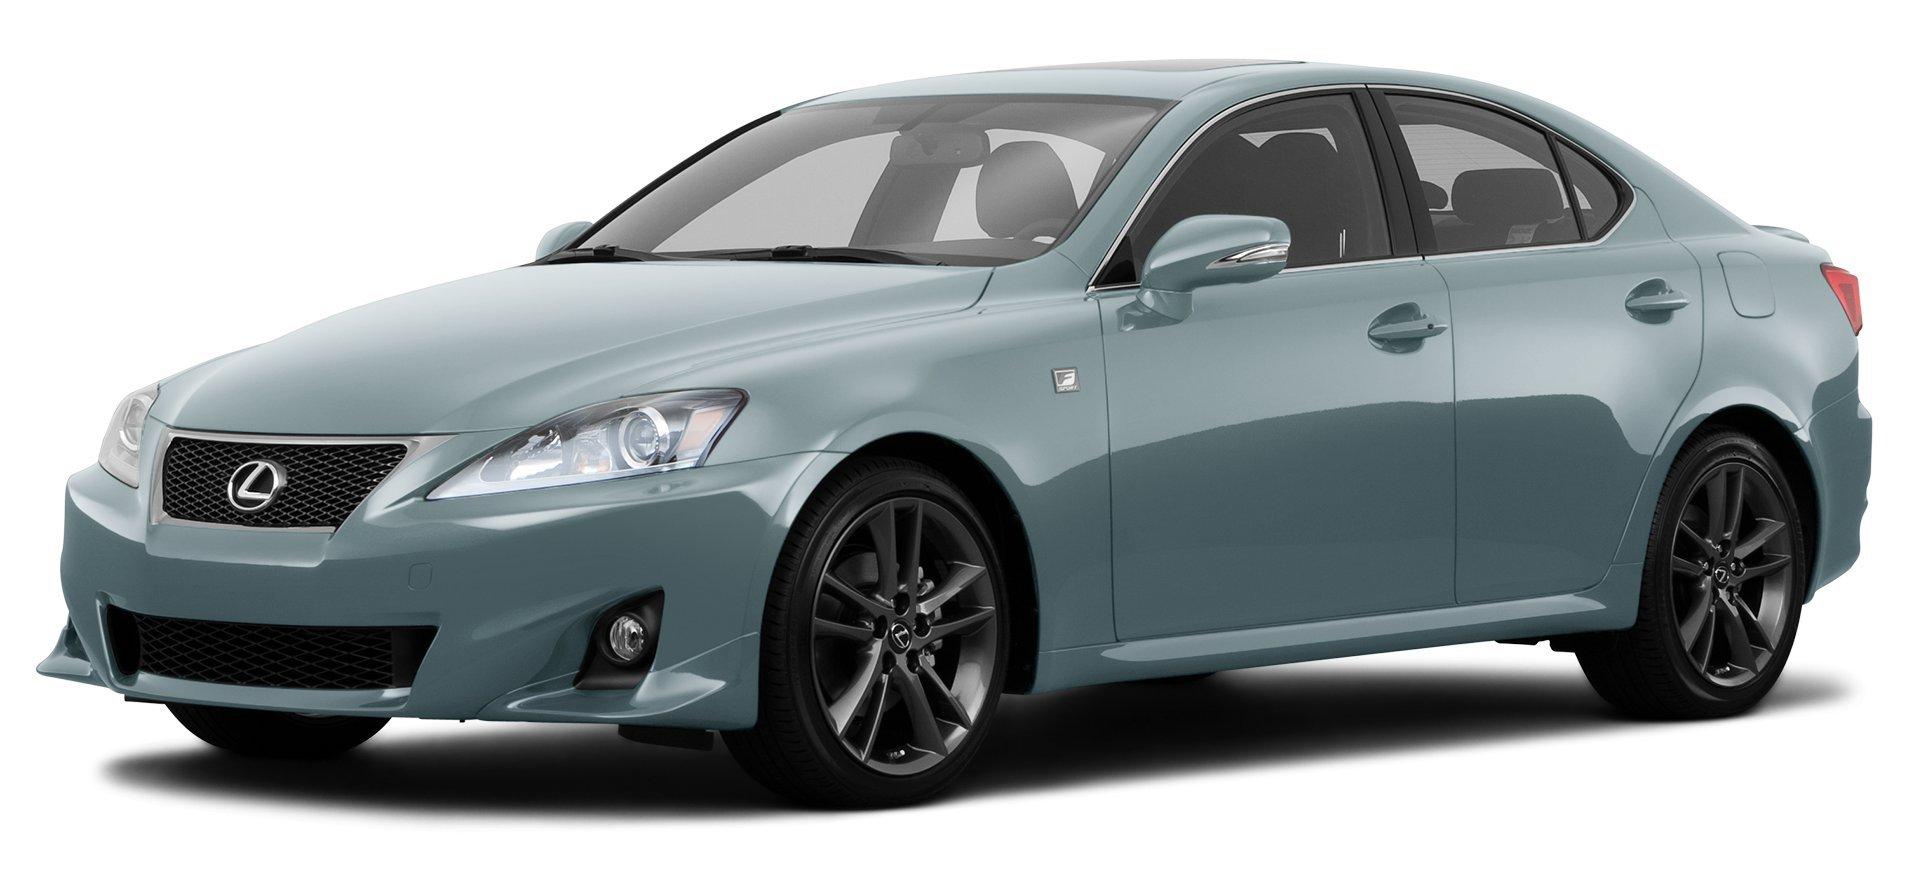 2011 Lexus IS250, 4 Door Sport Sedan Automatic Transmission All Wheel Drive  ...